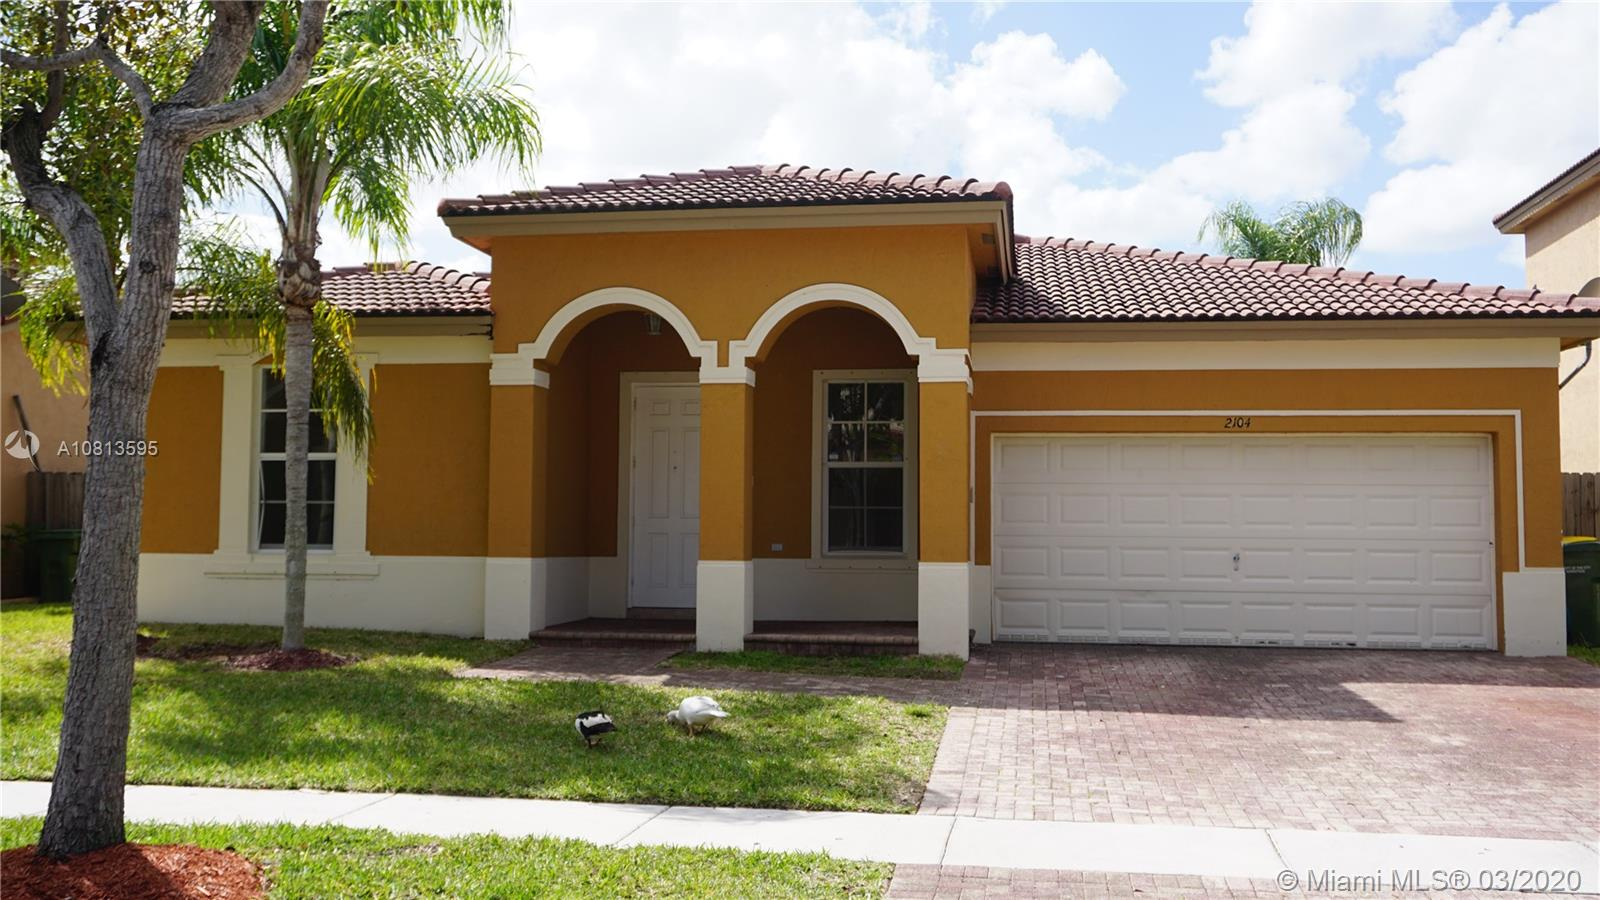 2104 NE 40th Rd #0, Homestead, FL 33033 - Homestead, FL real estate listing